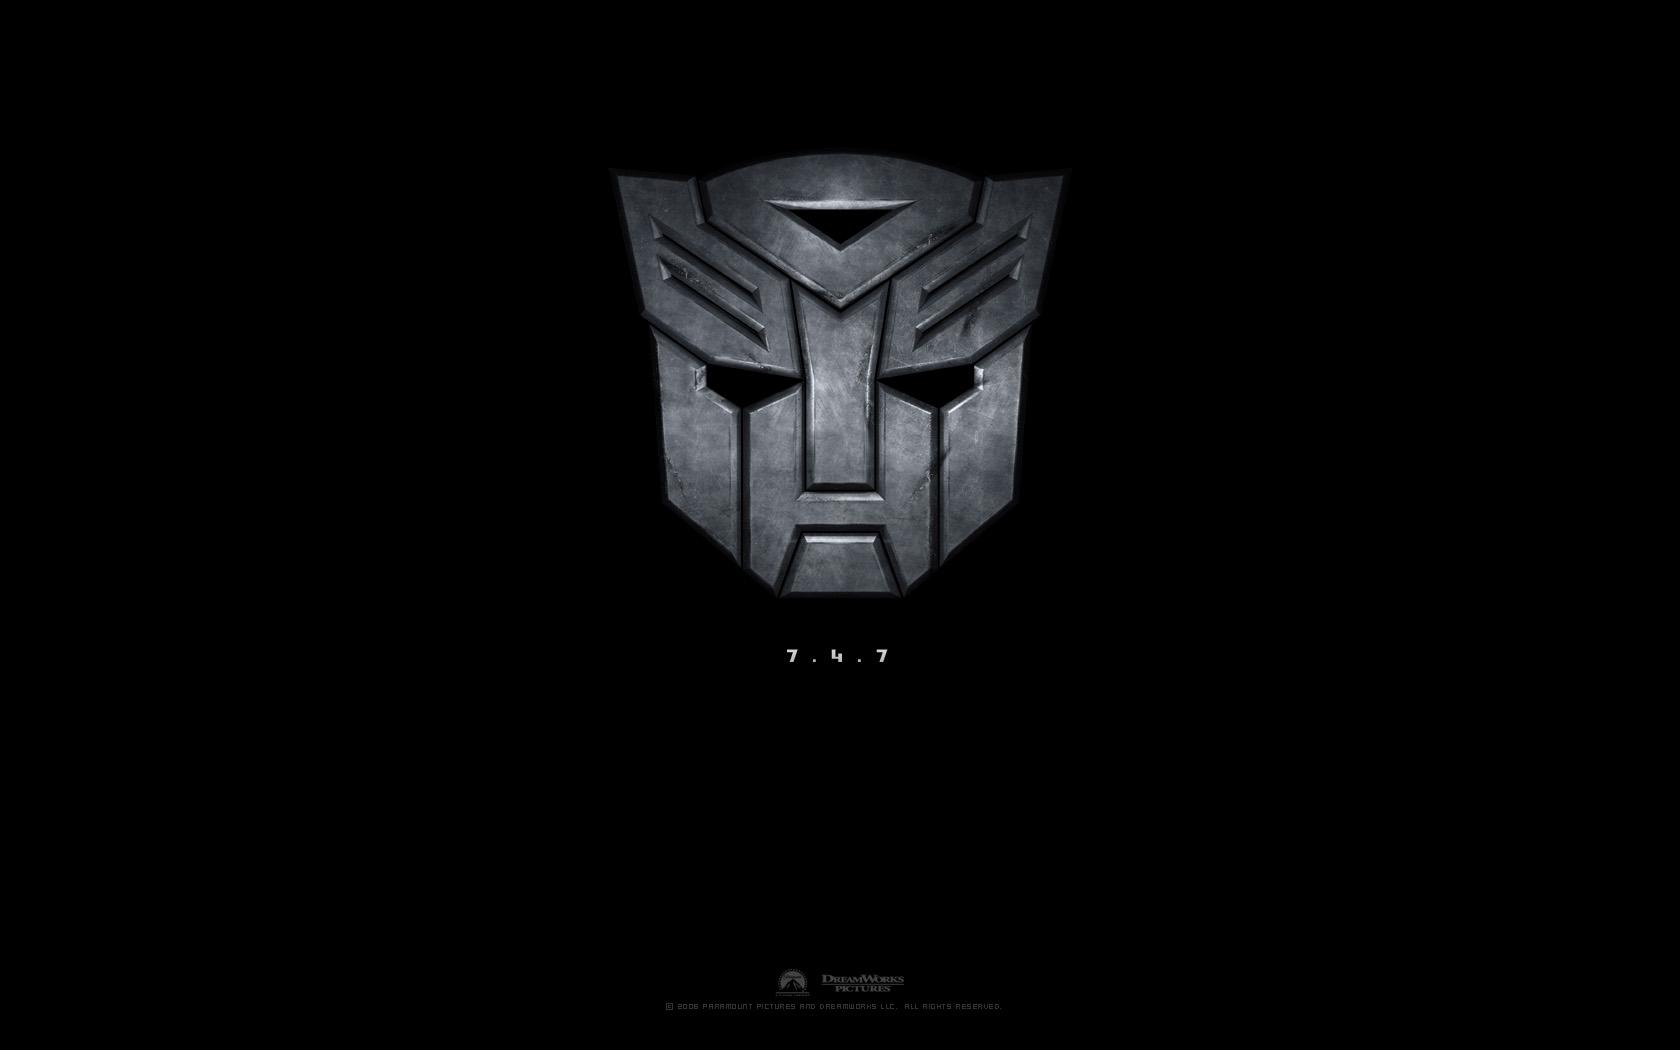 Transformers Movie Autobots   Transformers Wallpaper 35000 1680x1050